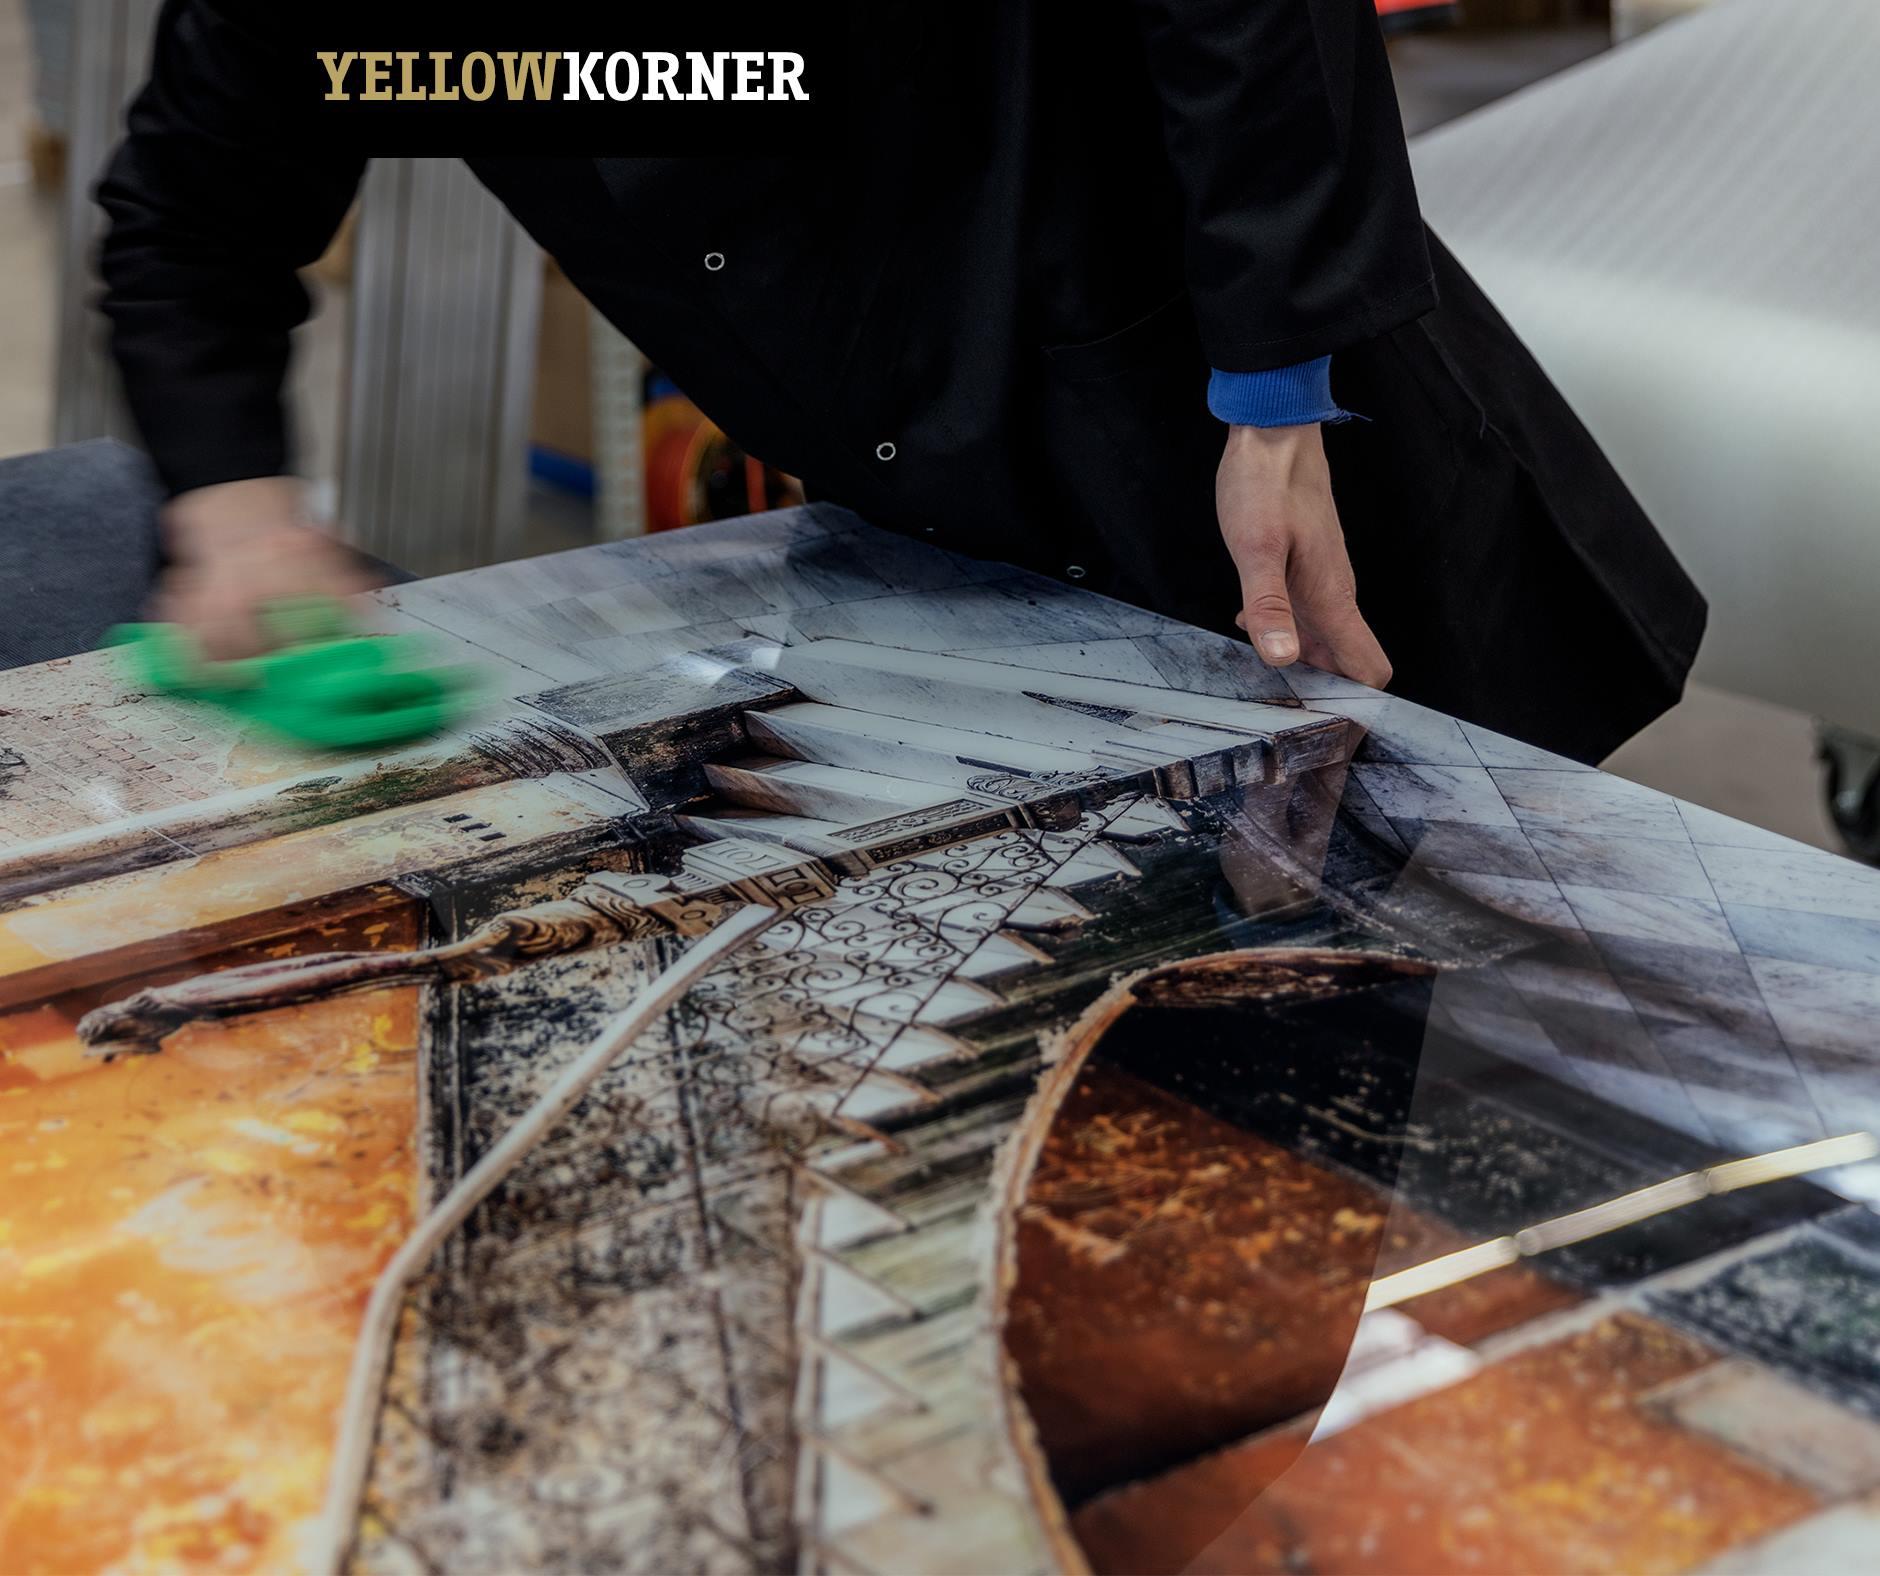 Yellowkorner – images en soldes – Dealabs